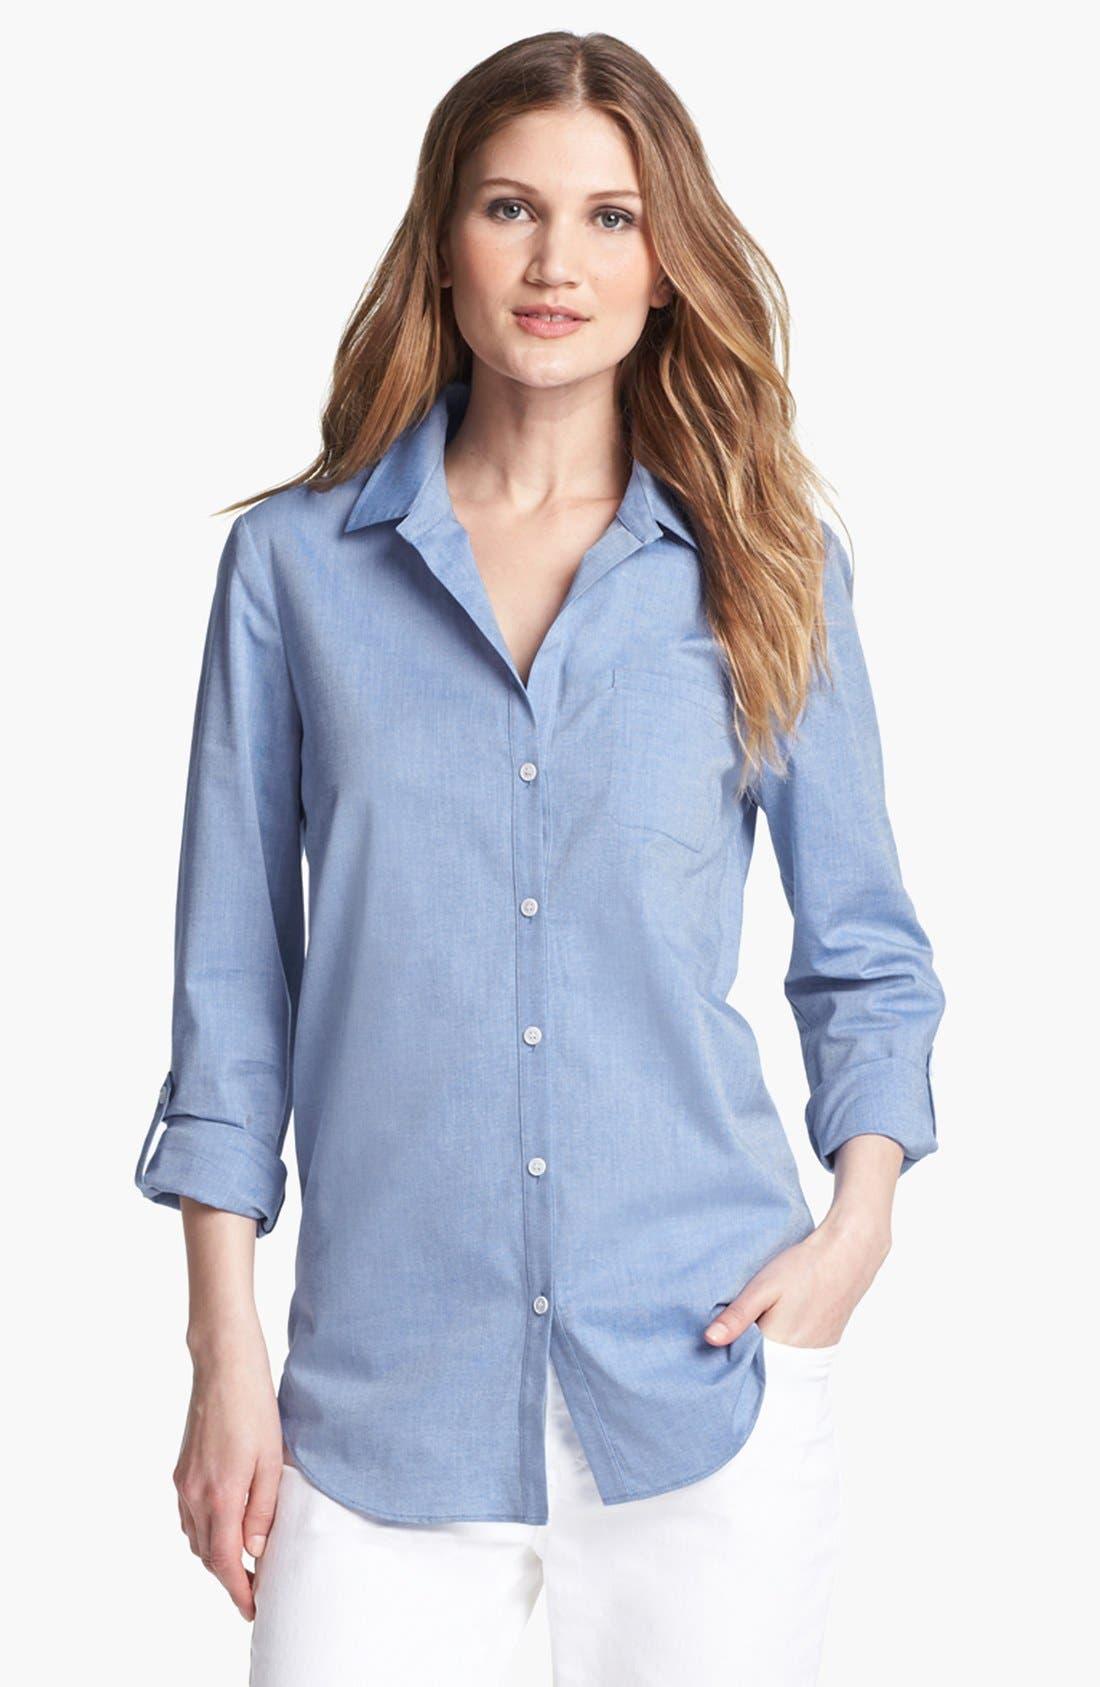 Alternate Image 1 Selected - Lafayette 148 New York Oxford Shirt